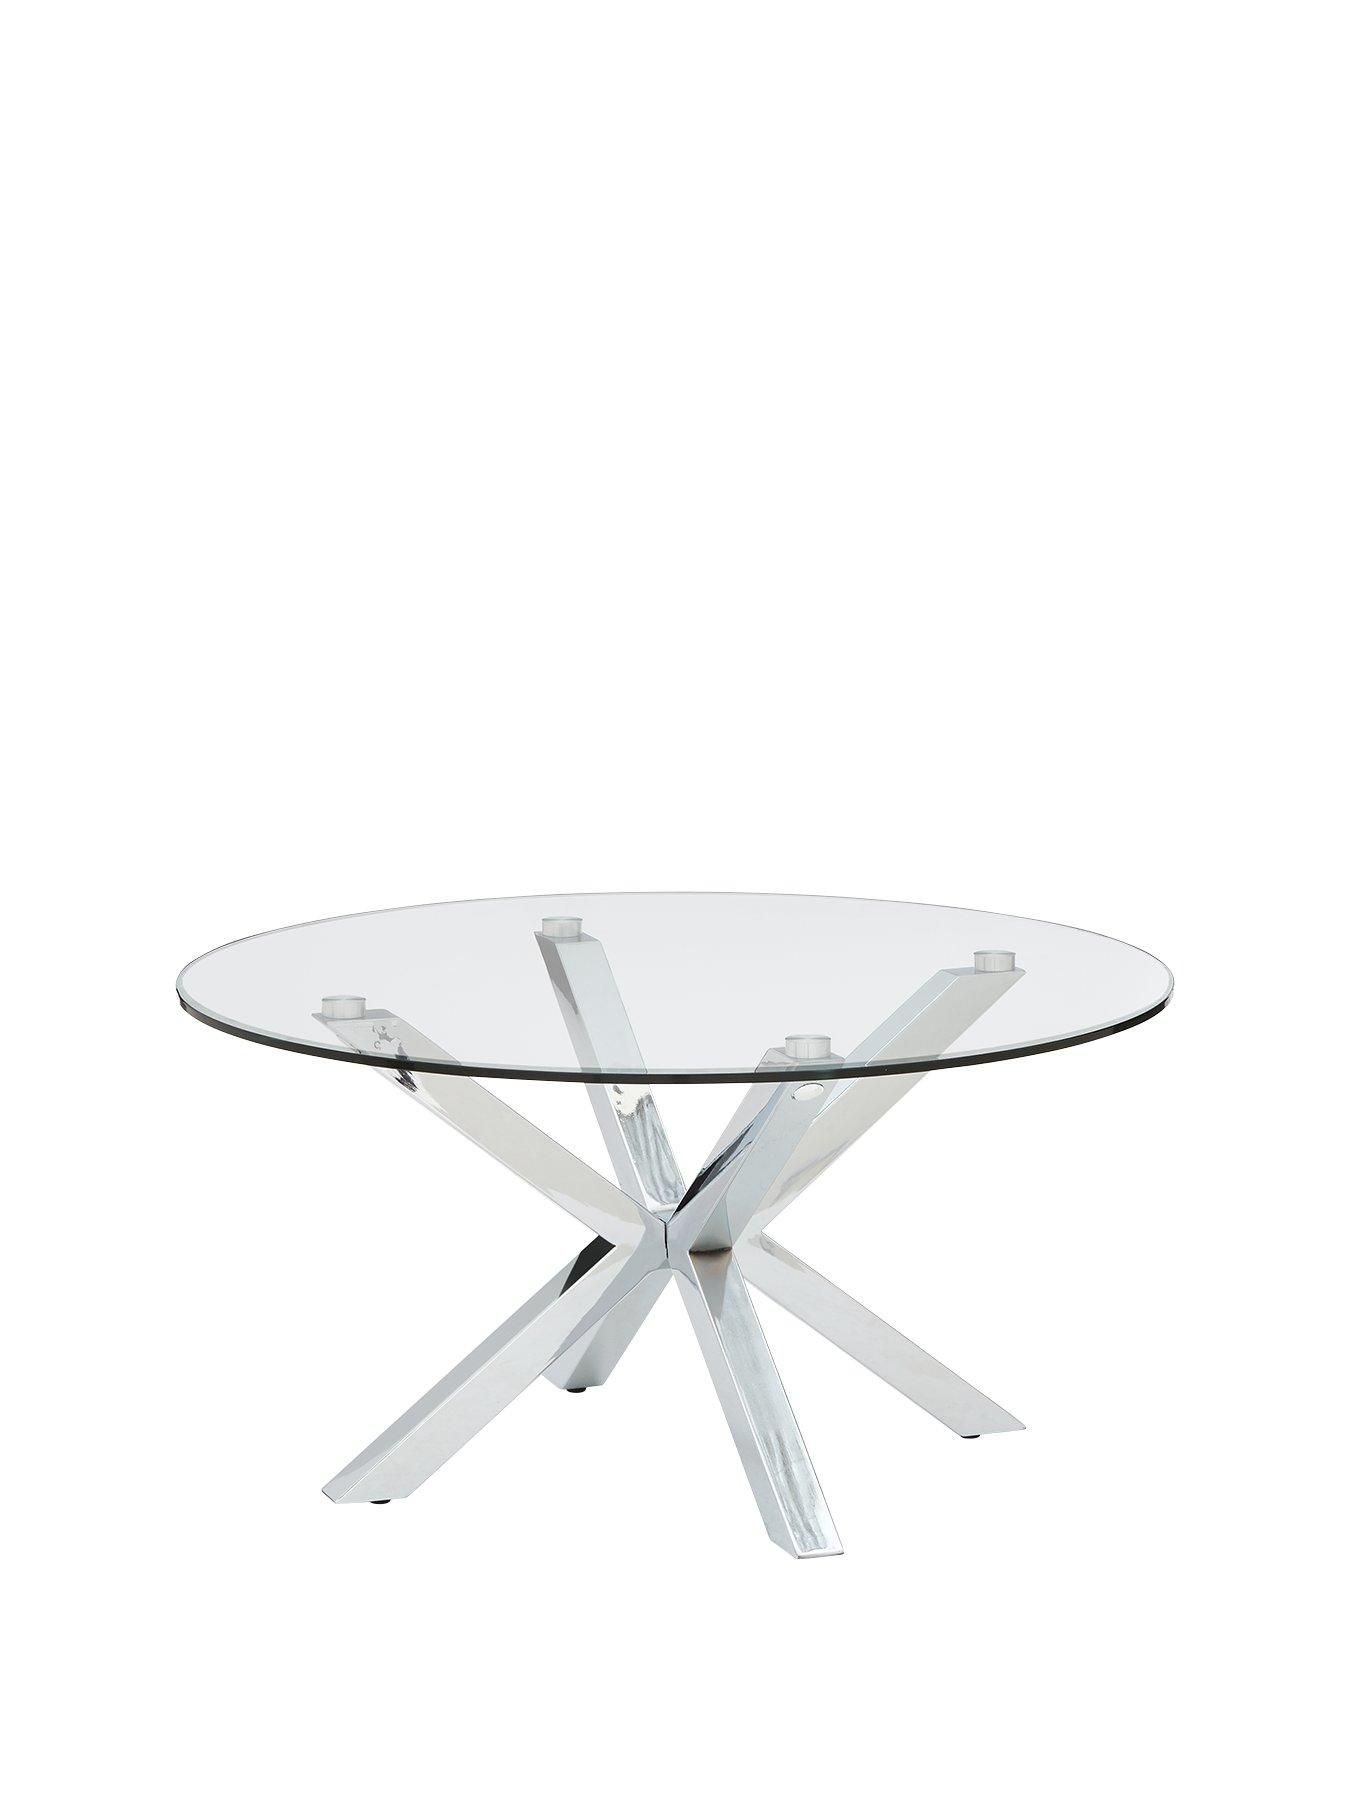 Chopstick Glass And Chrome Coffee Table Glass Top Table Coffee Table Chrome [ 1800 x 1350 Pixel ]